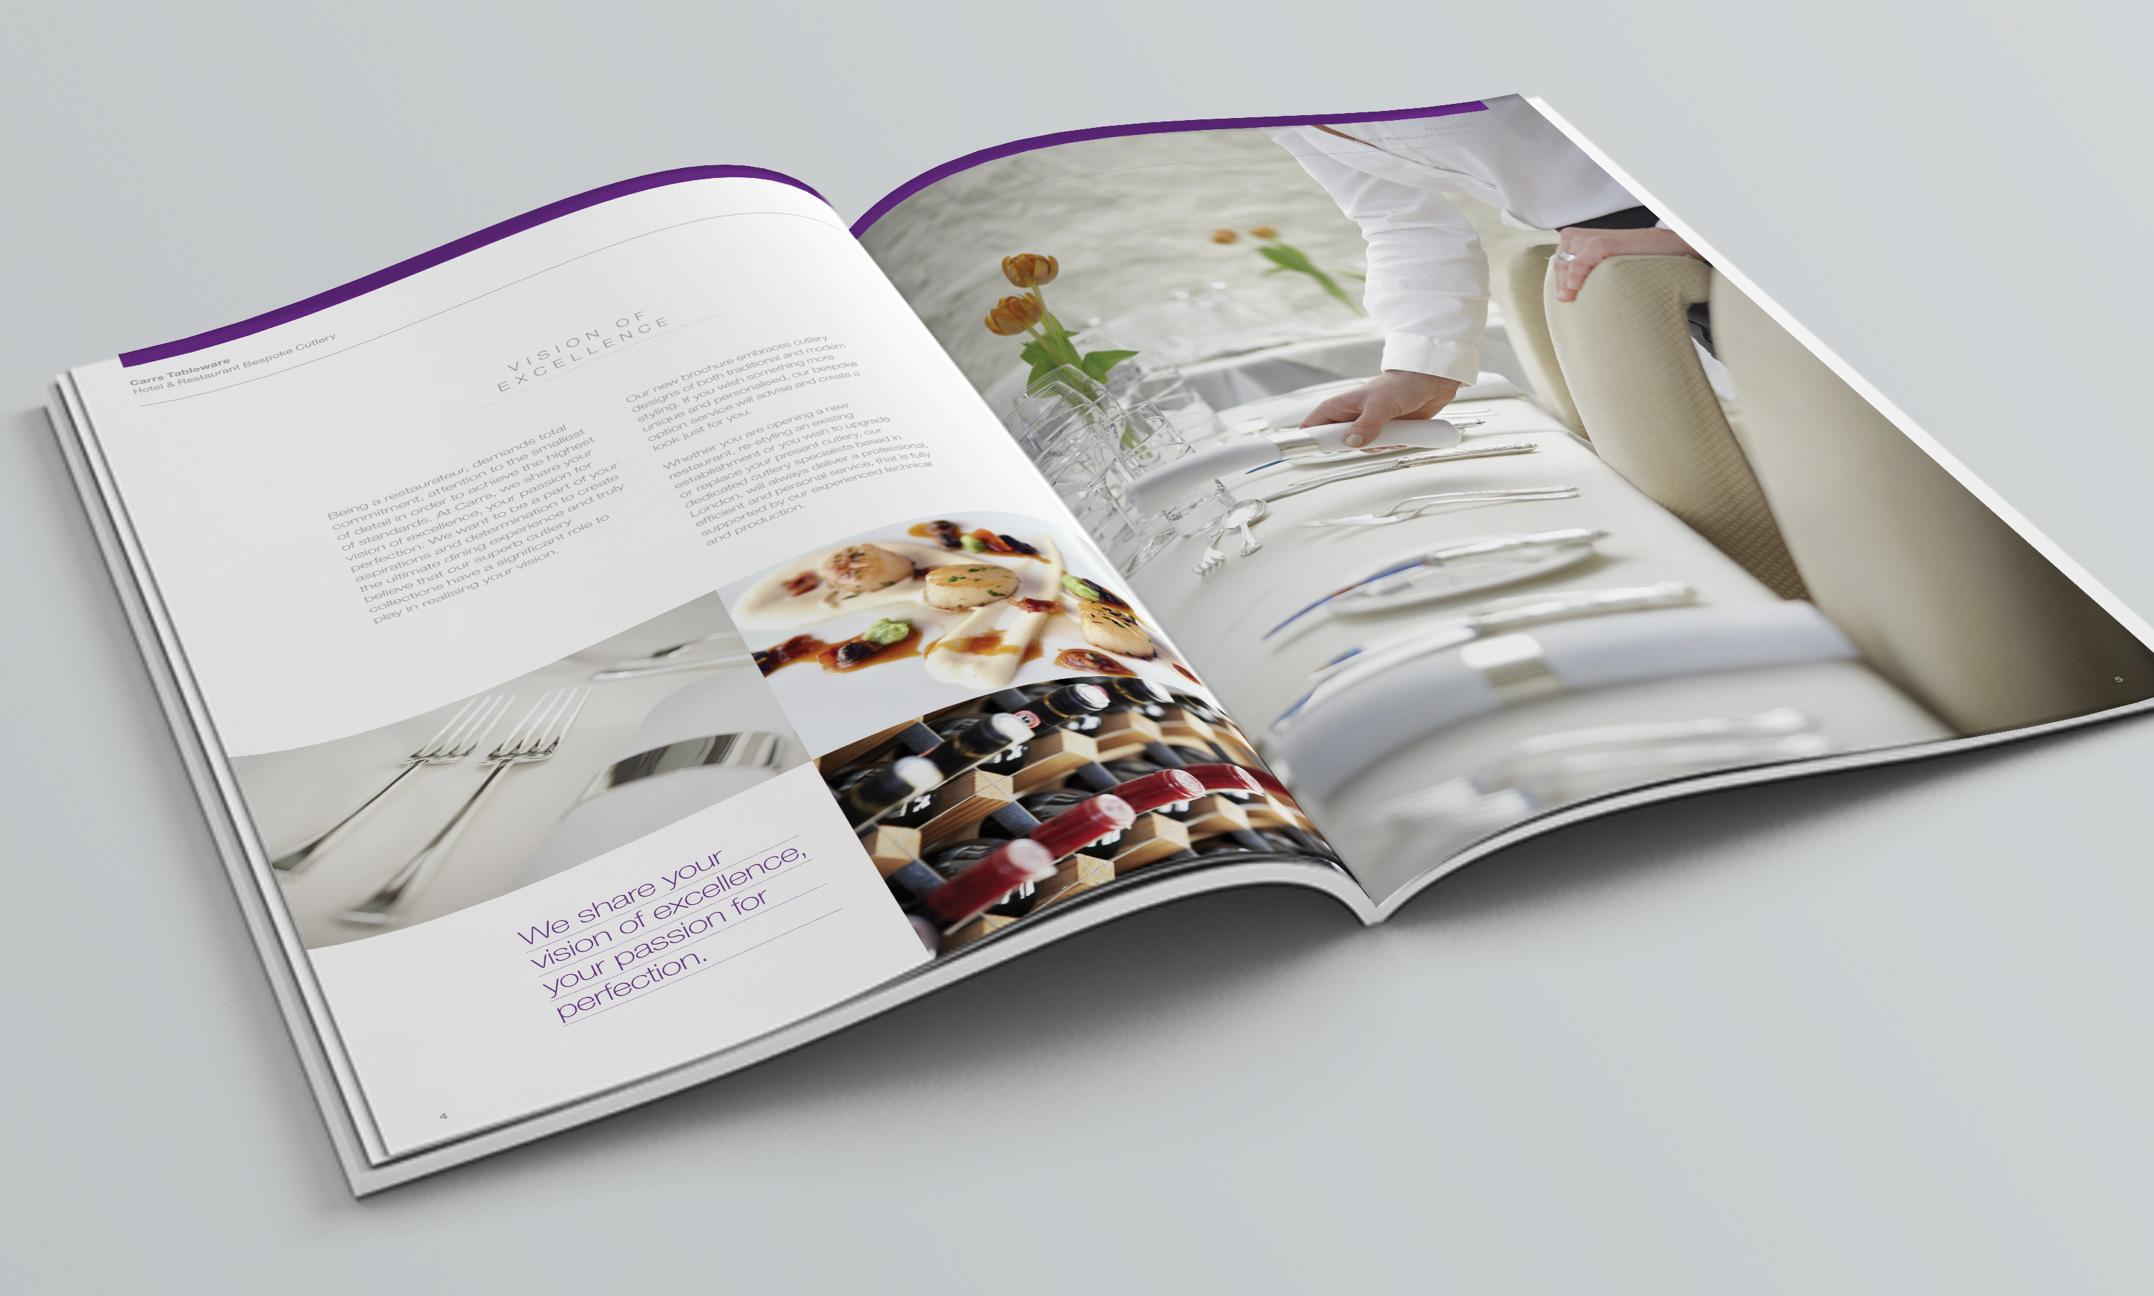 Carrs Silver brochure spread